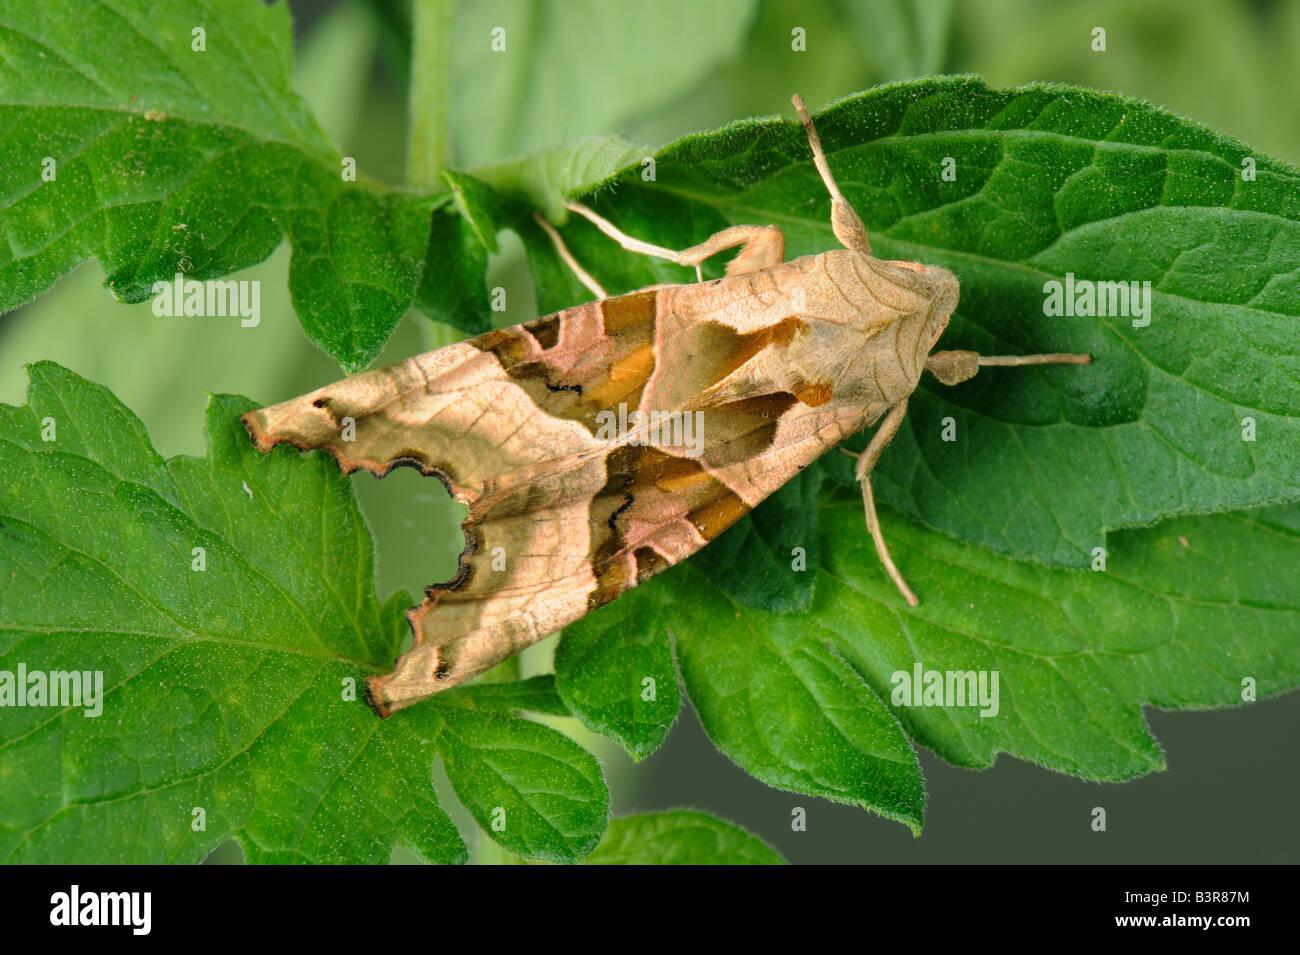 Nuances Phlogophora meticulosa angle papillon sur feuilles de tomate Photo Stock